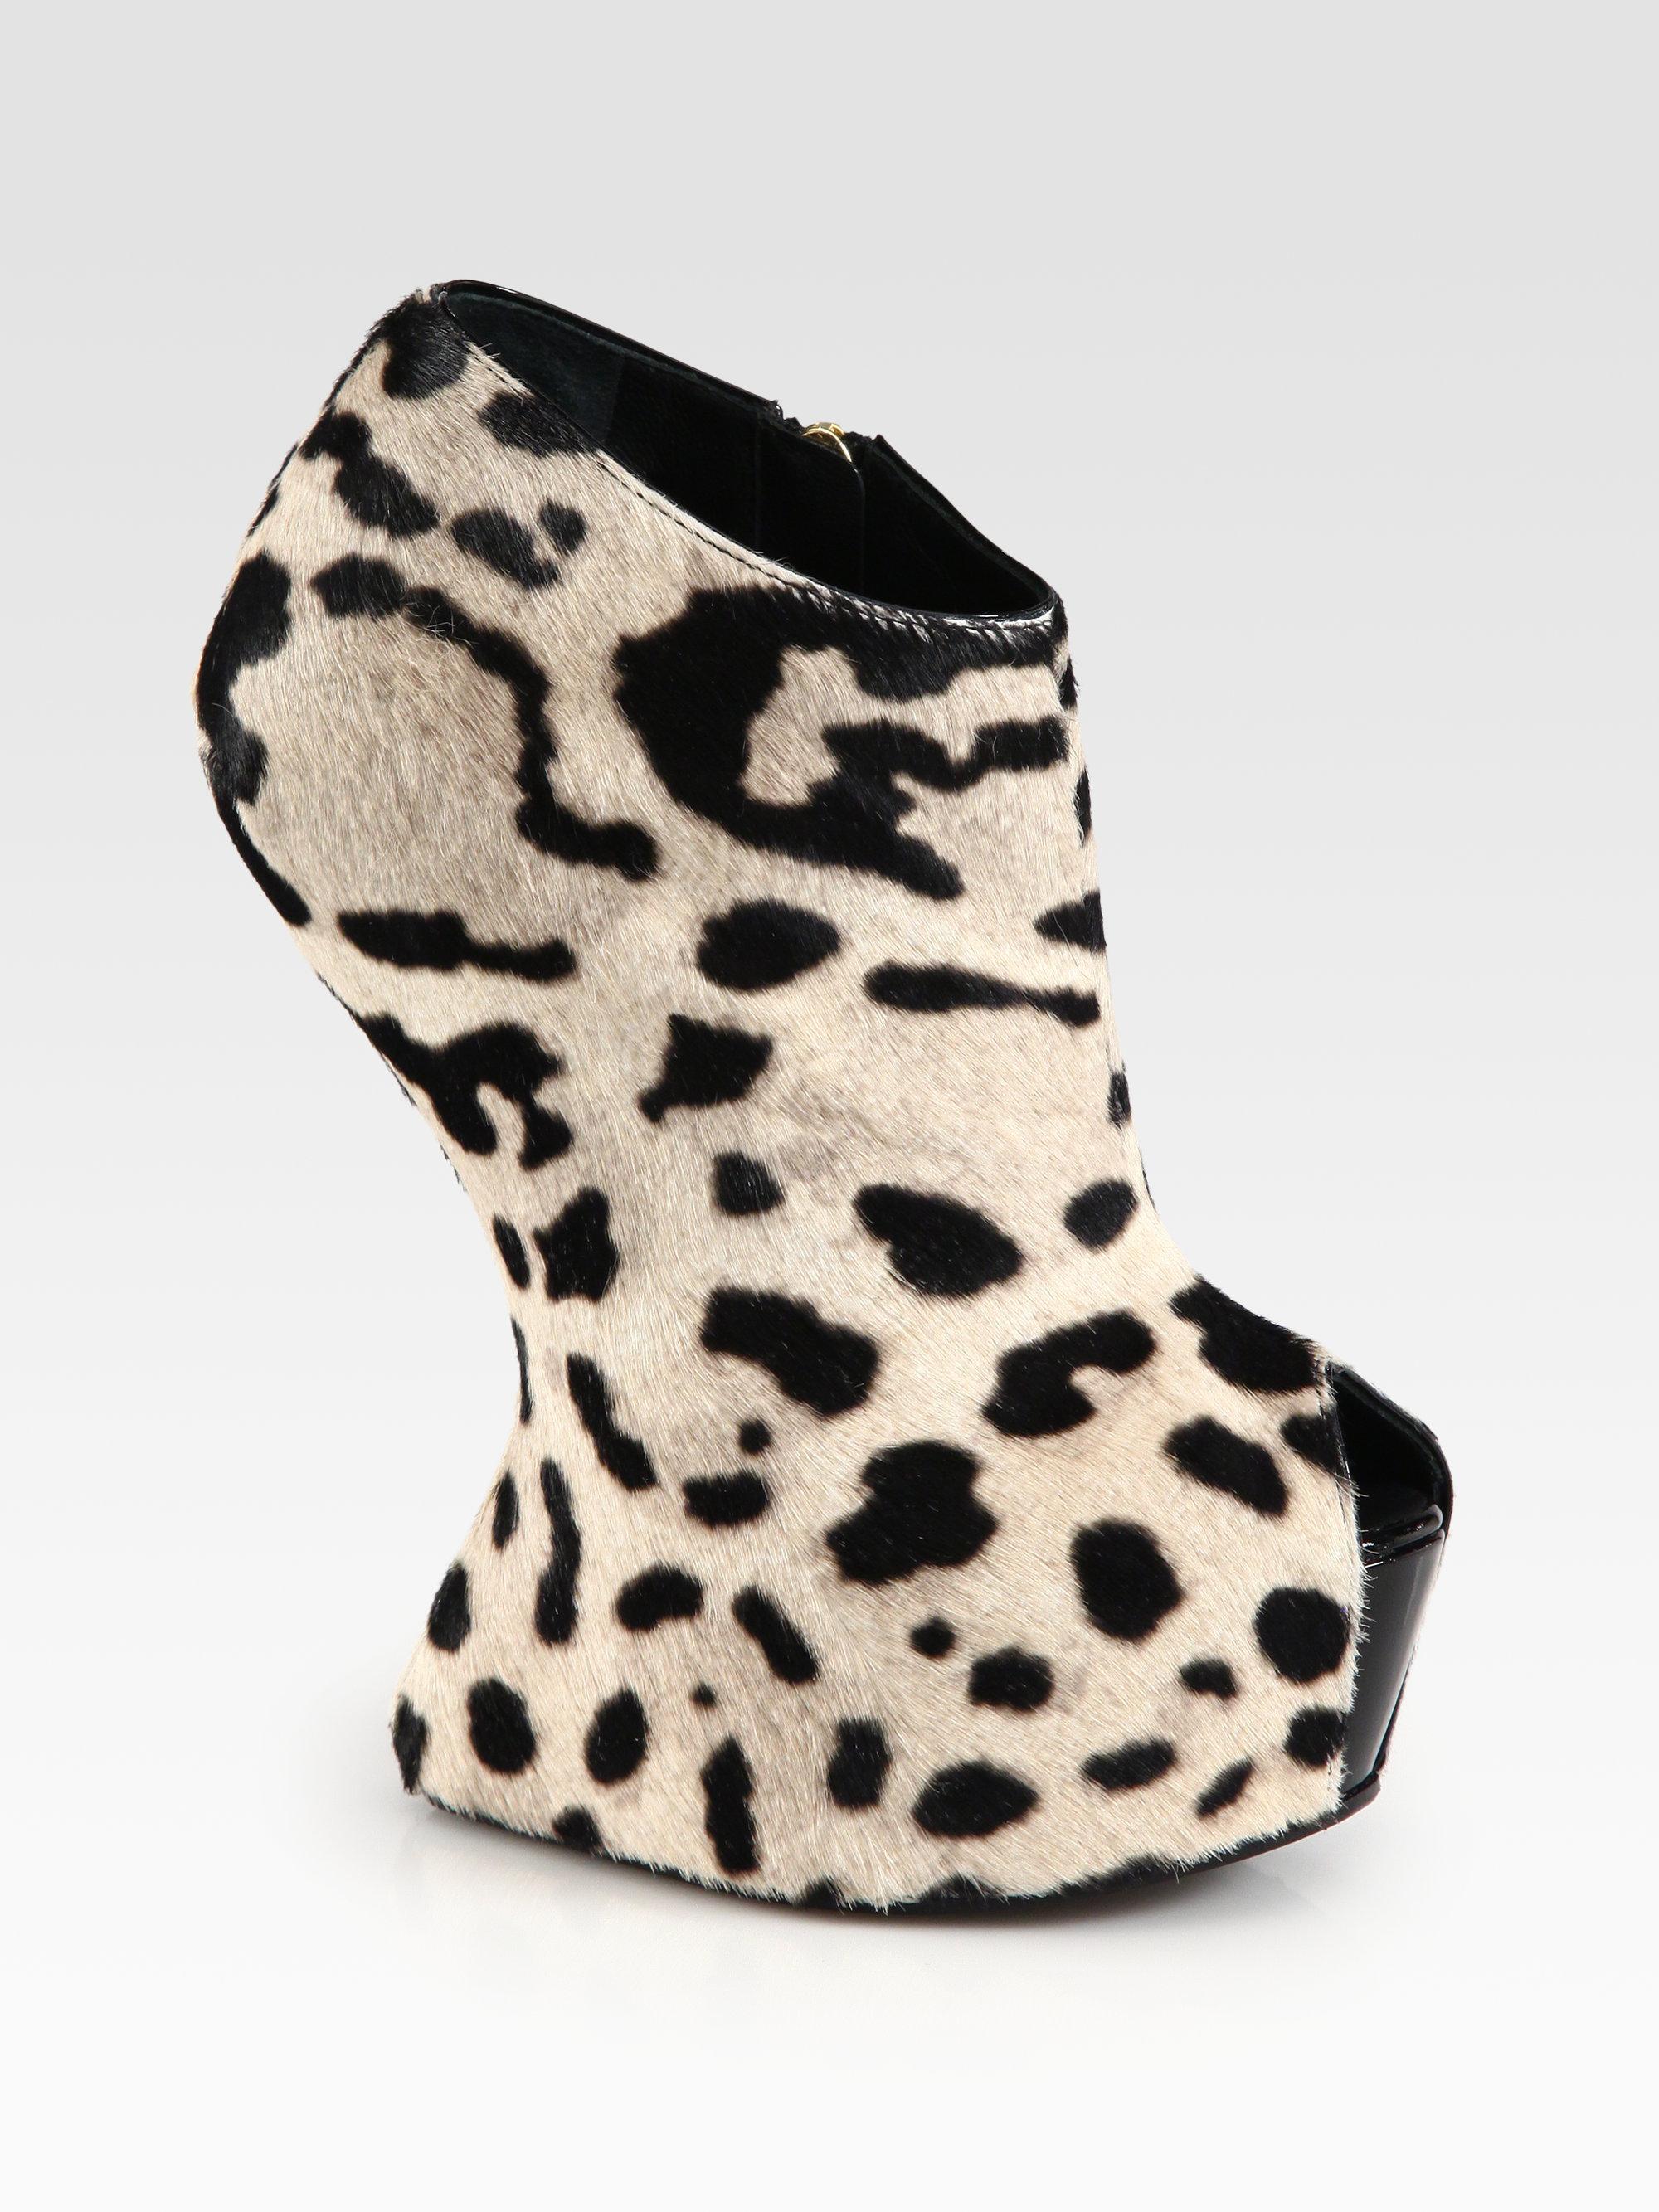 93665e2640a70 Giuseppe Zanotti Leopard Print Calf Hair Wedge Ankle Boots in ...